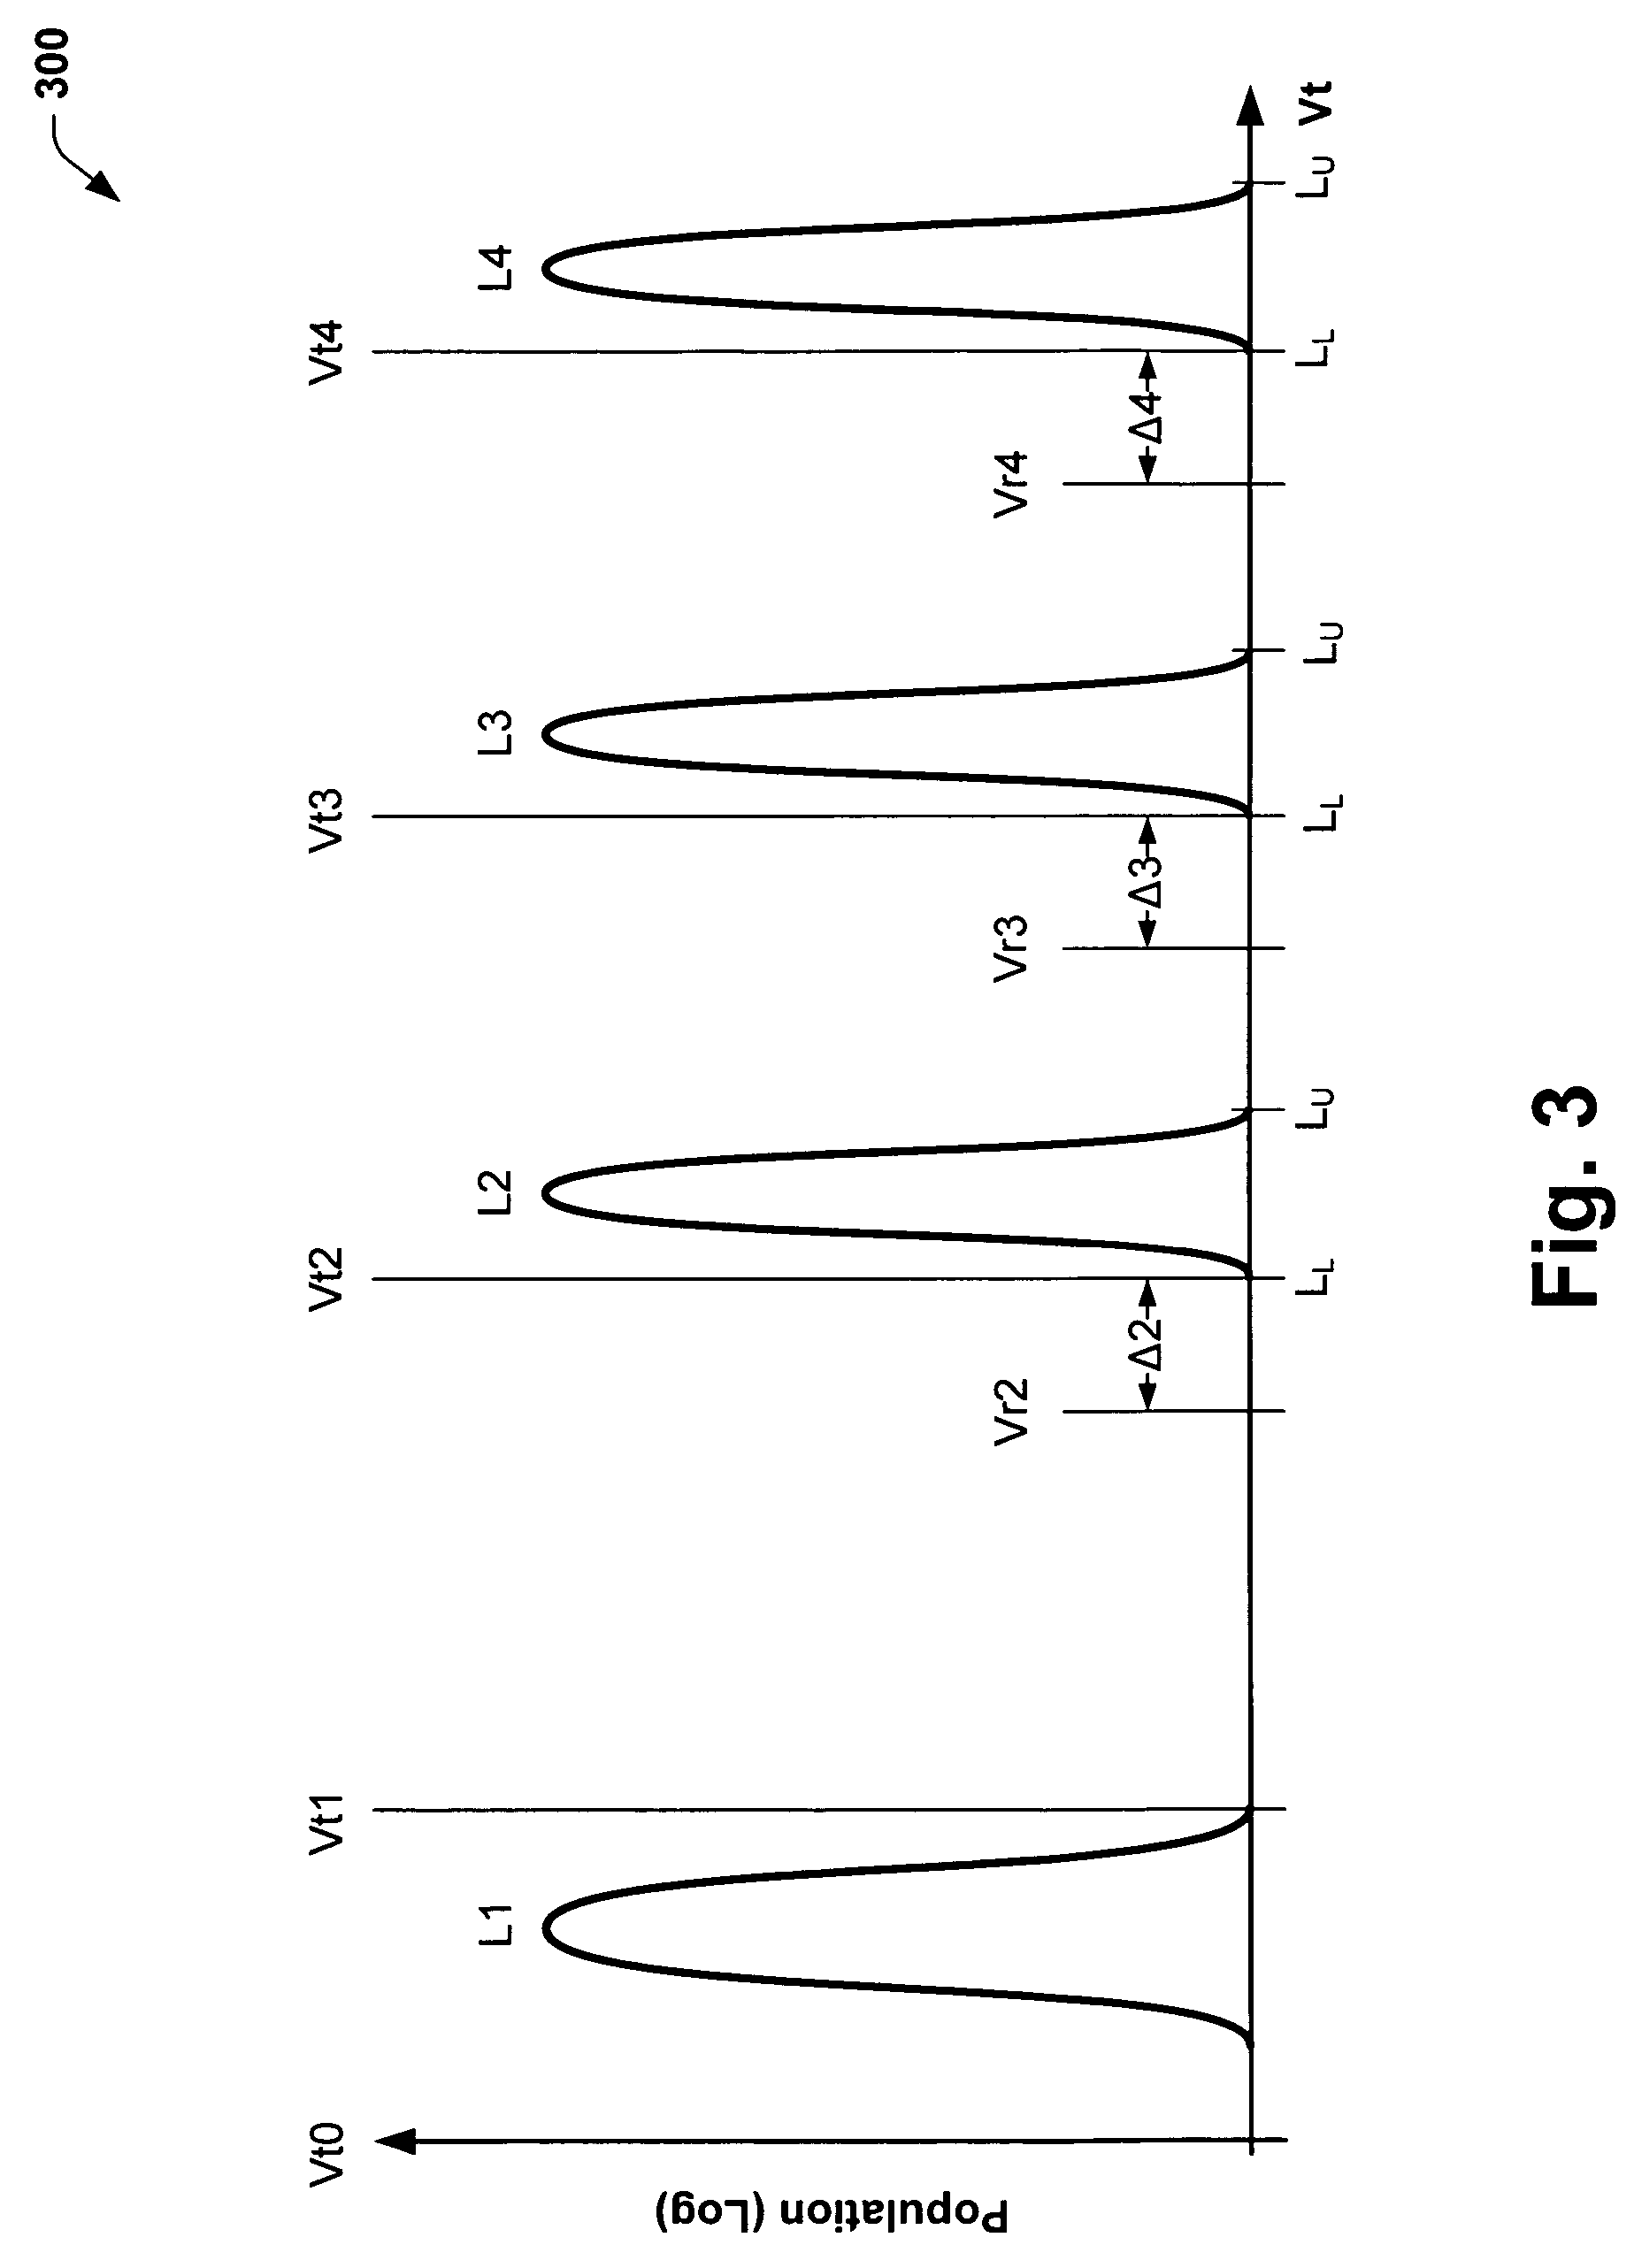 Patent US7130210 - Multi-level ONO flash program algorithm